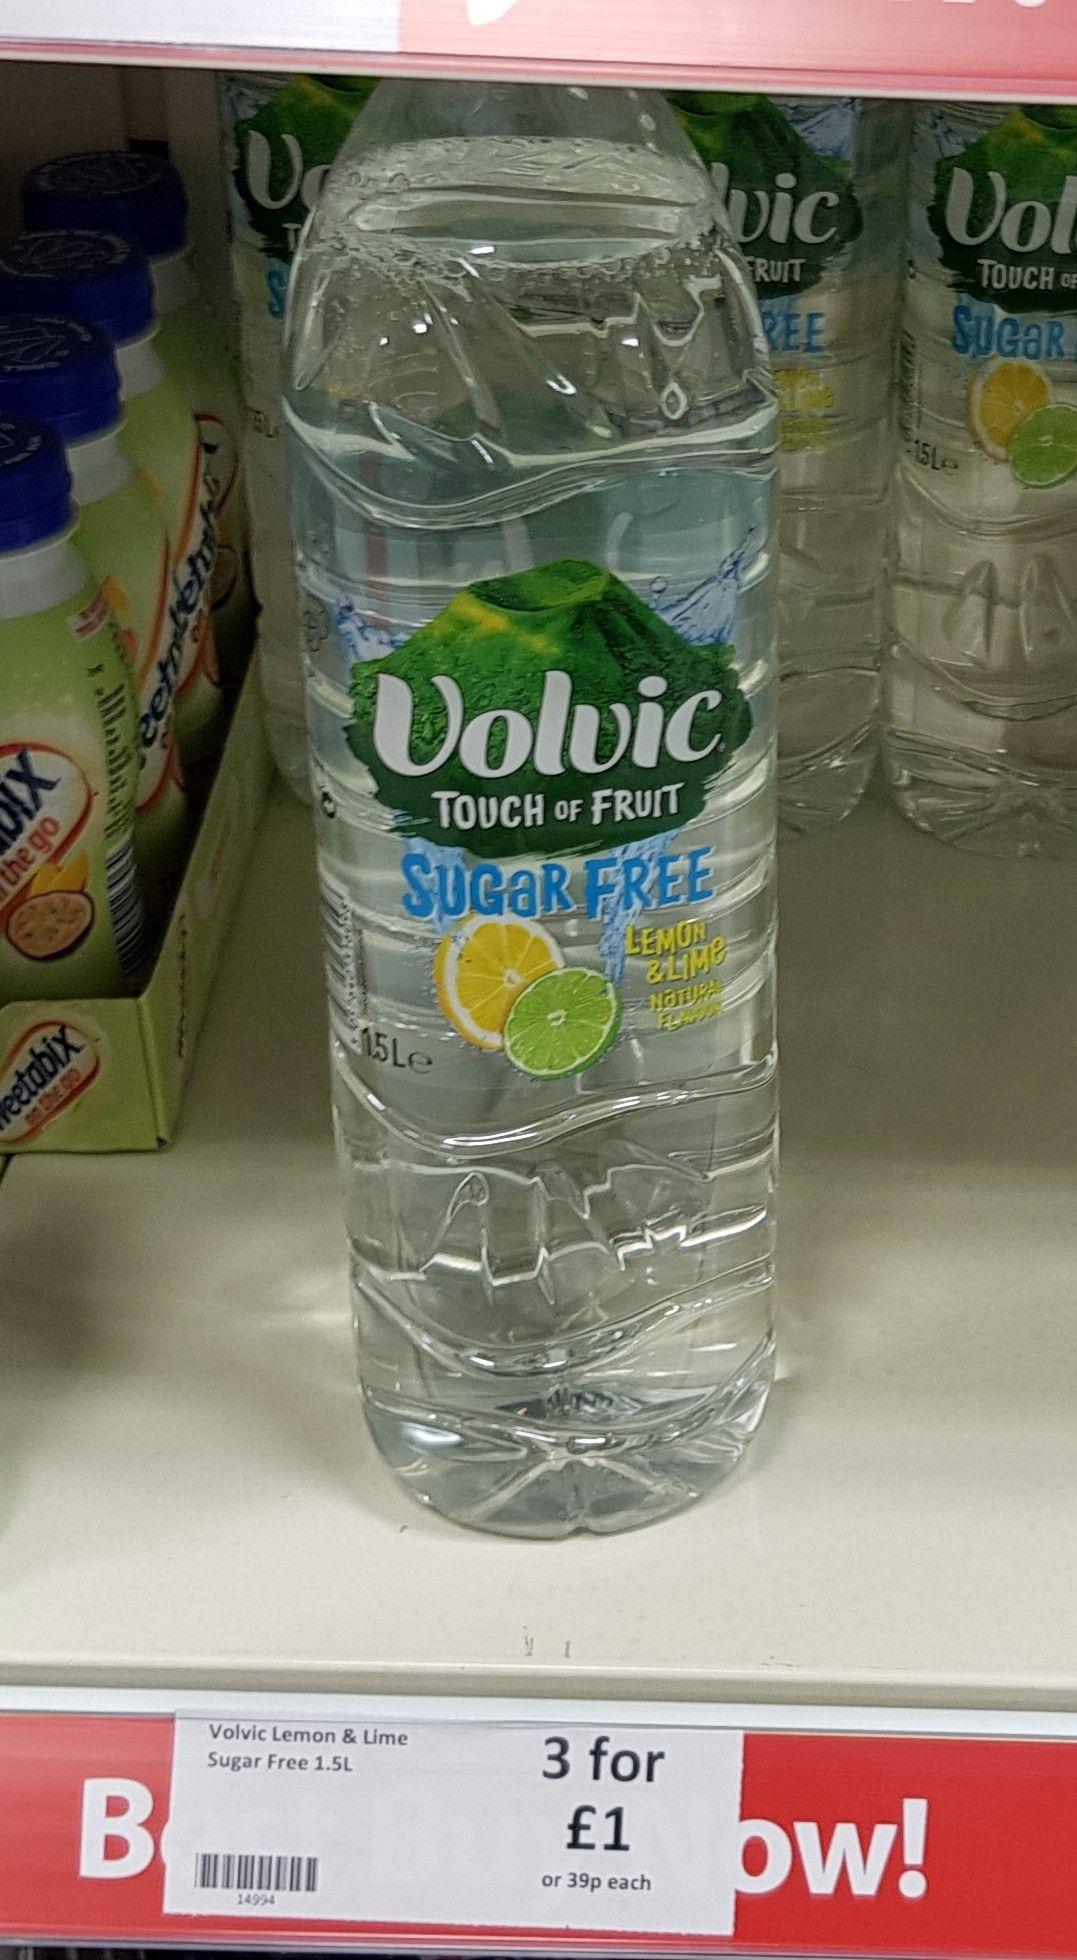 Volvic Sugar Free Lemon & Lime 1.5 litre 3 for £1 @ Heron